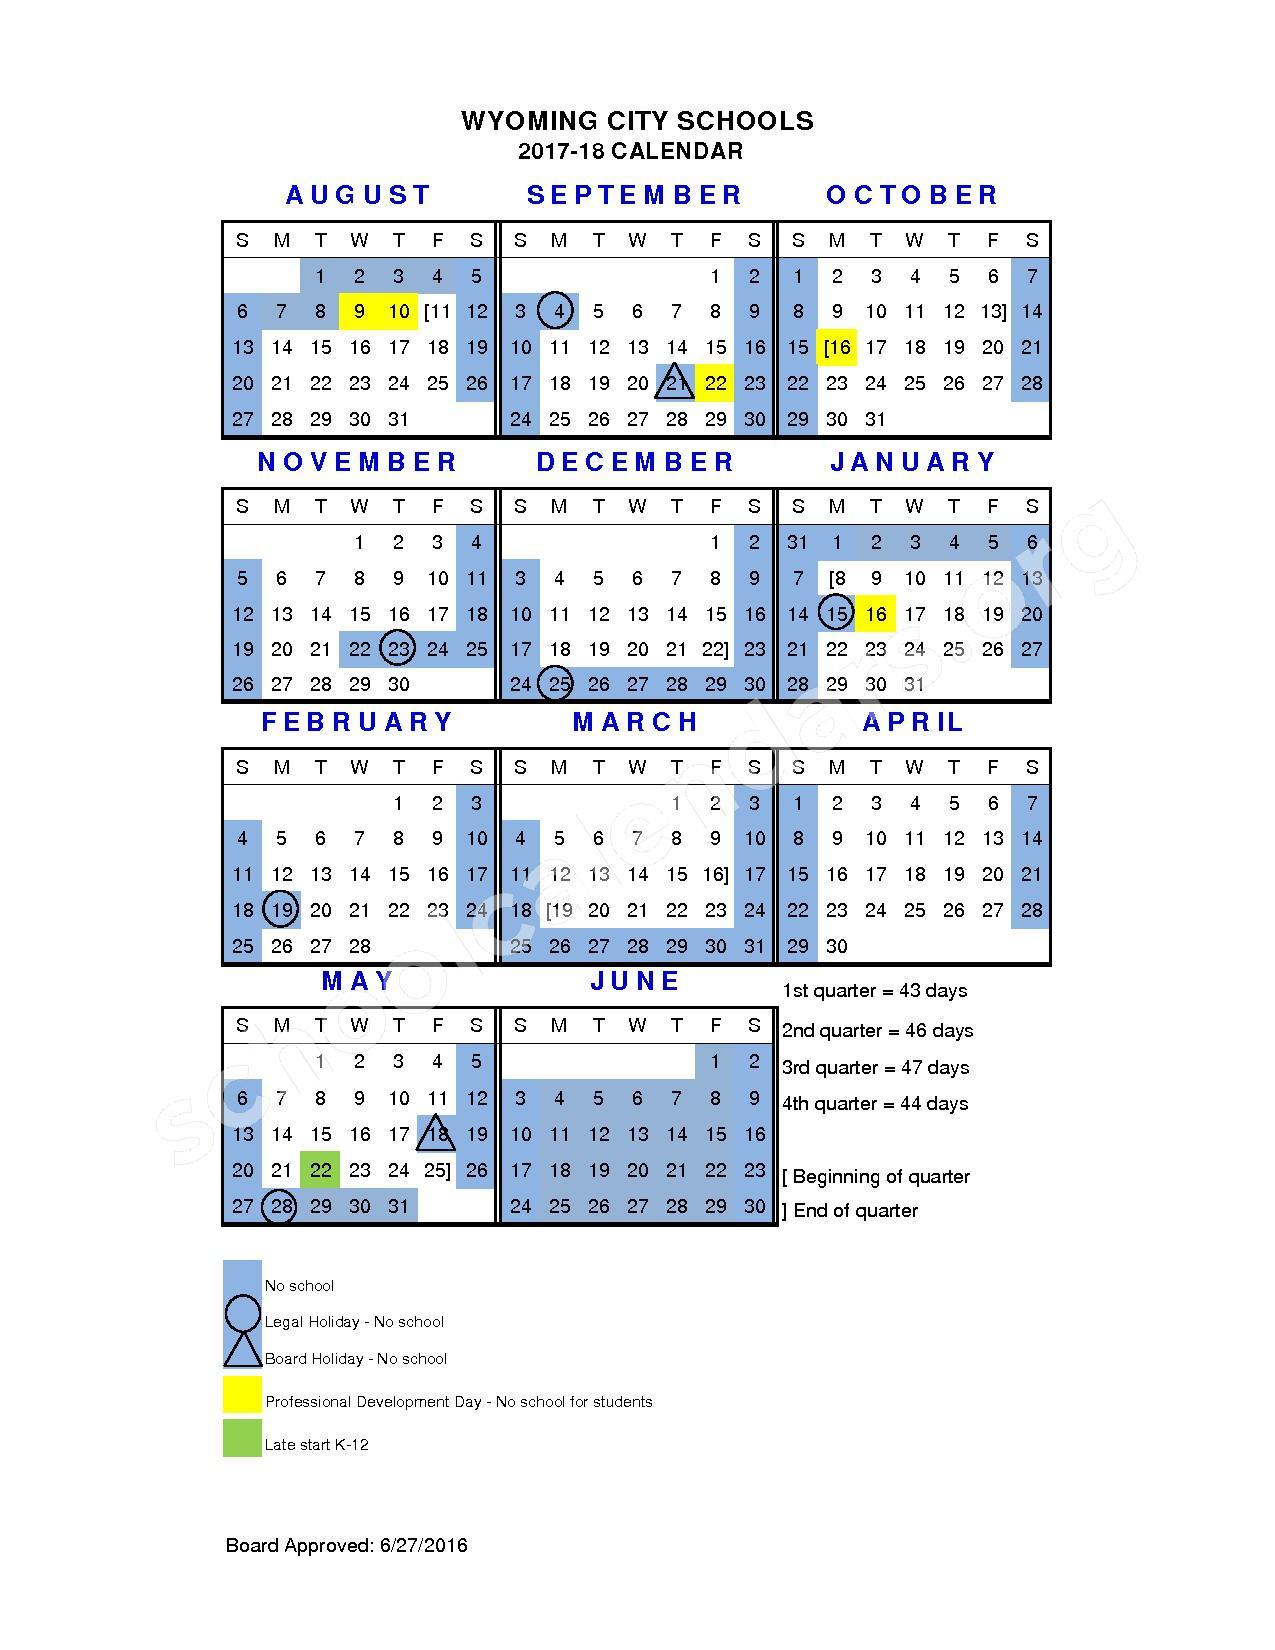 2017 - 2018 District Calendar – Wyoming City Schools – page 1